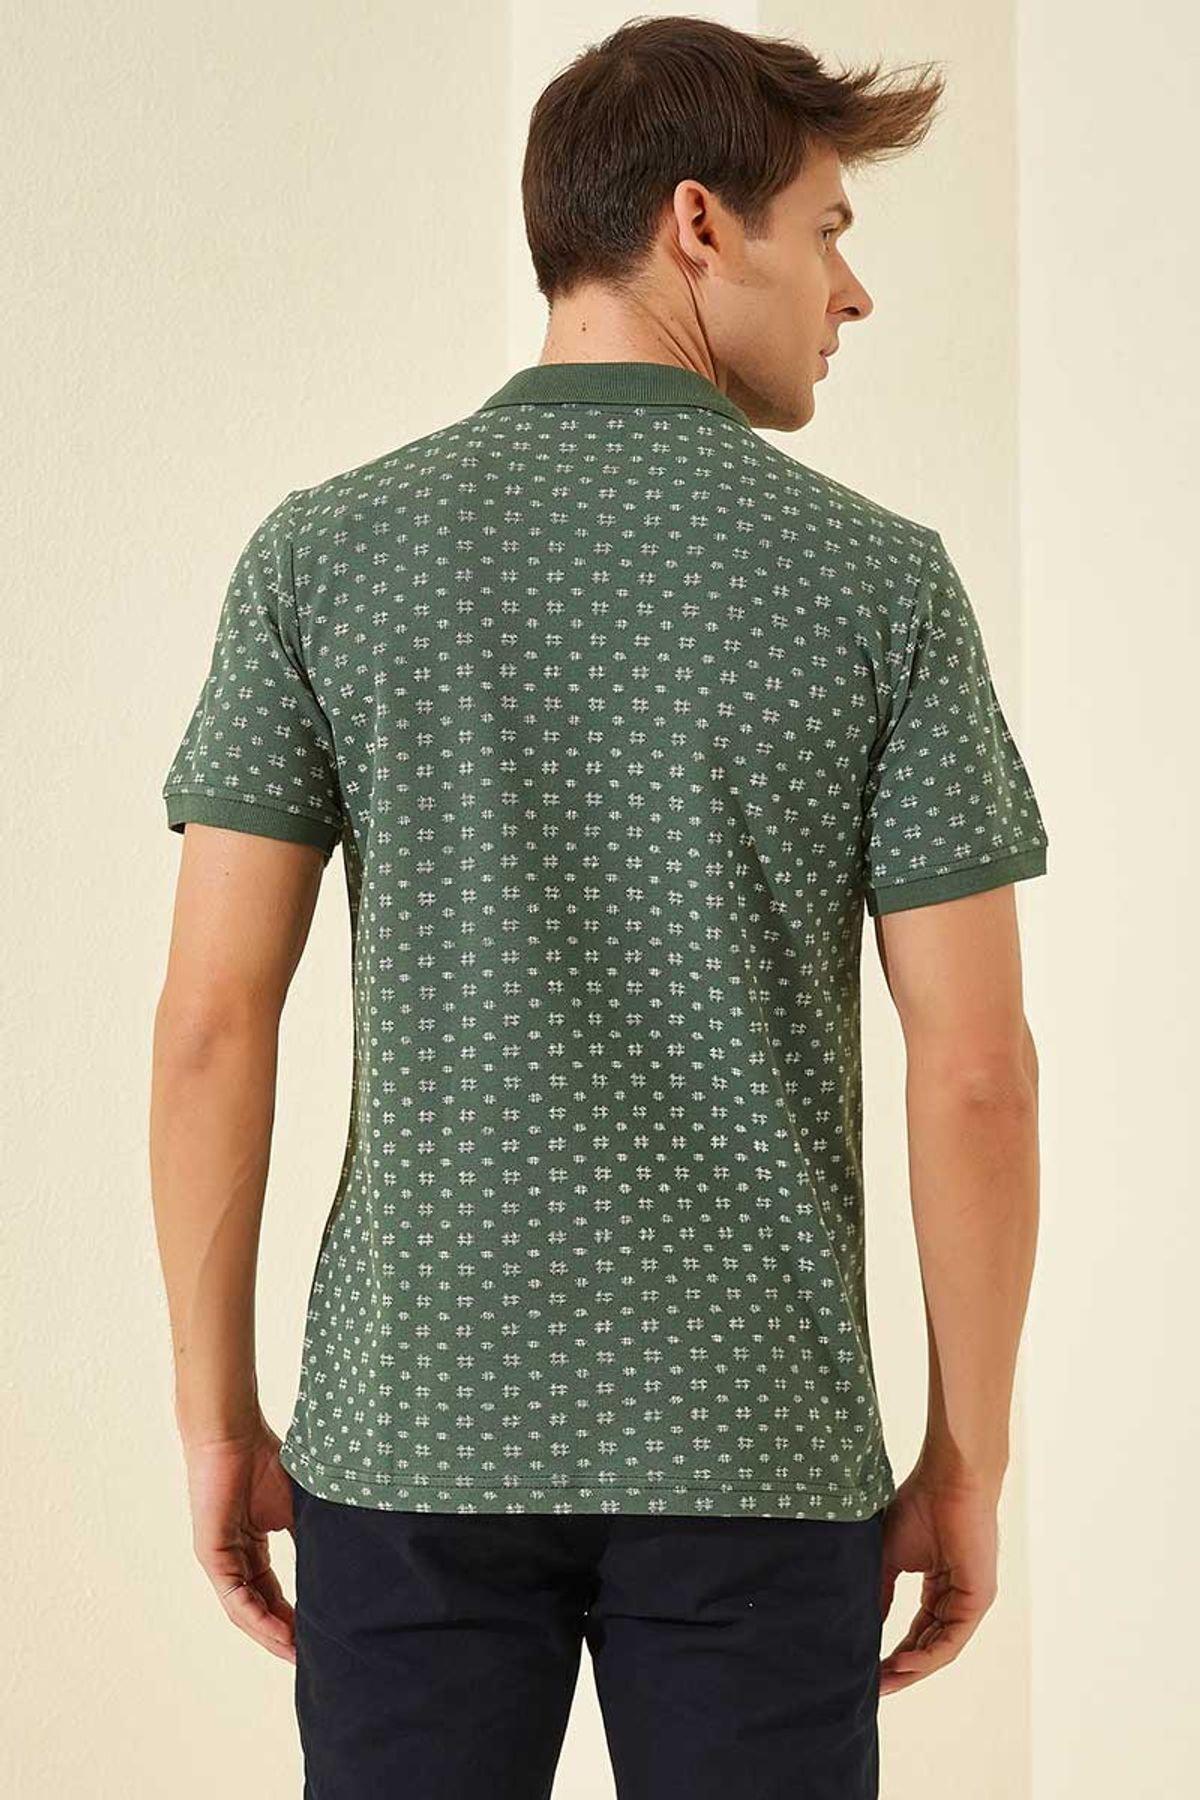 Tommy Life Klasik Desenli Polo Yaka Yeşil Erkek Tshirt T08ER-87795_1 2